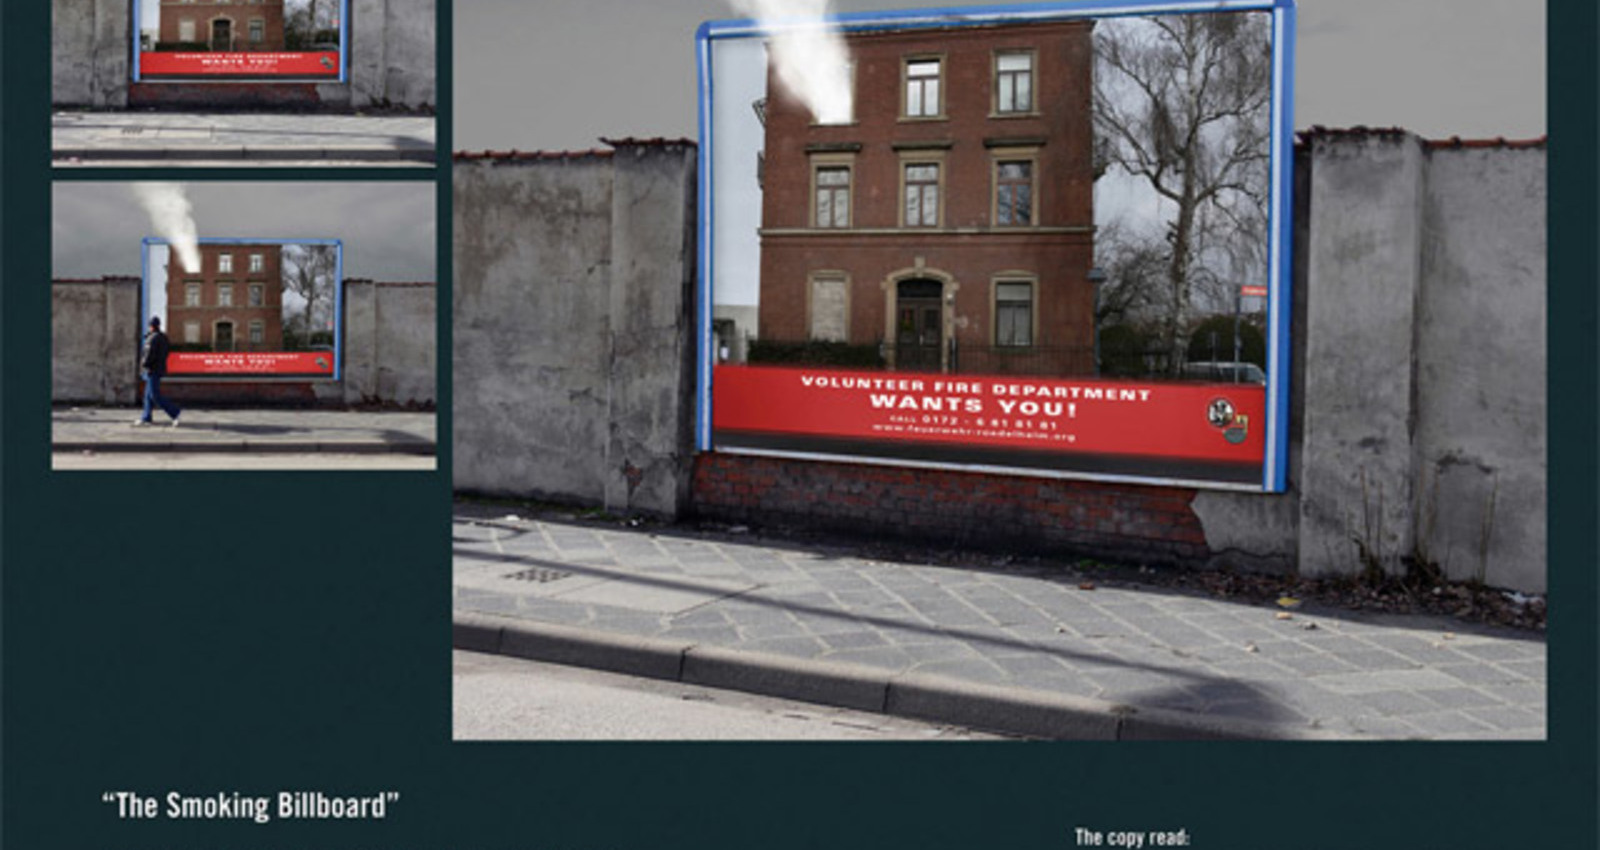 The Smoking Billboard